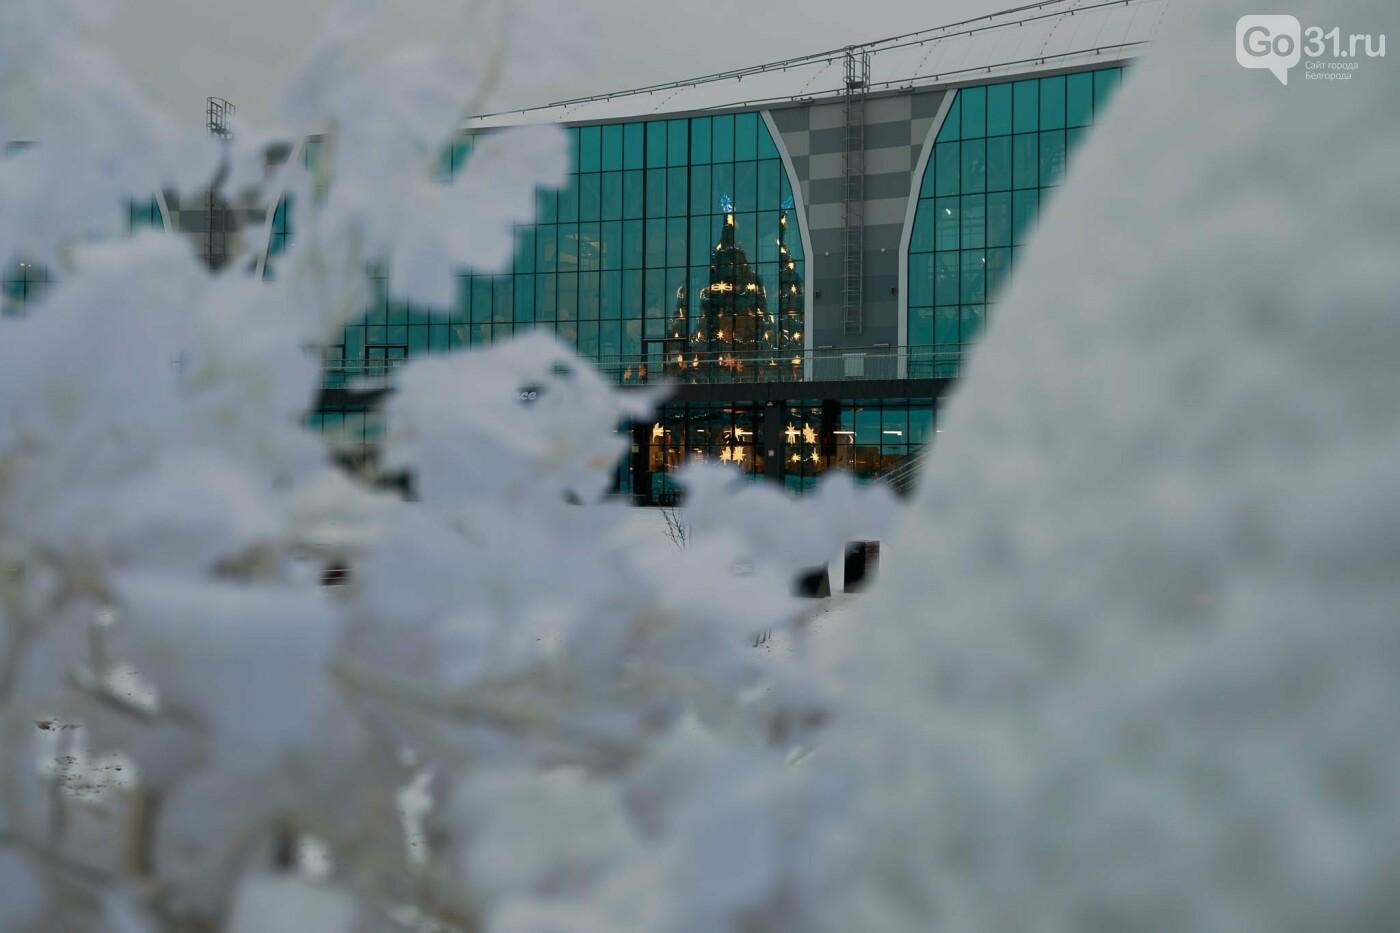 Ёлка у белгородского аквапарка, Фото: Антон Вергун